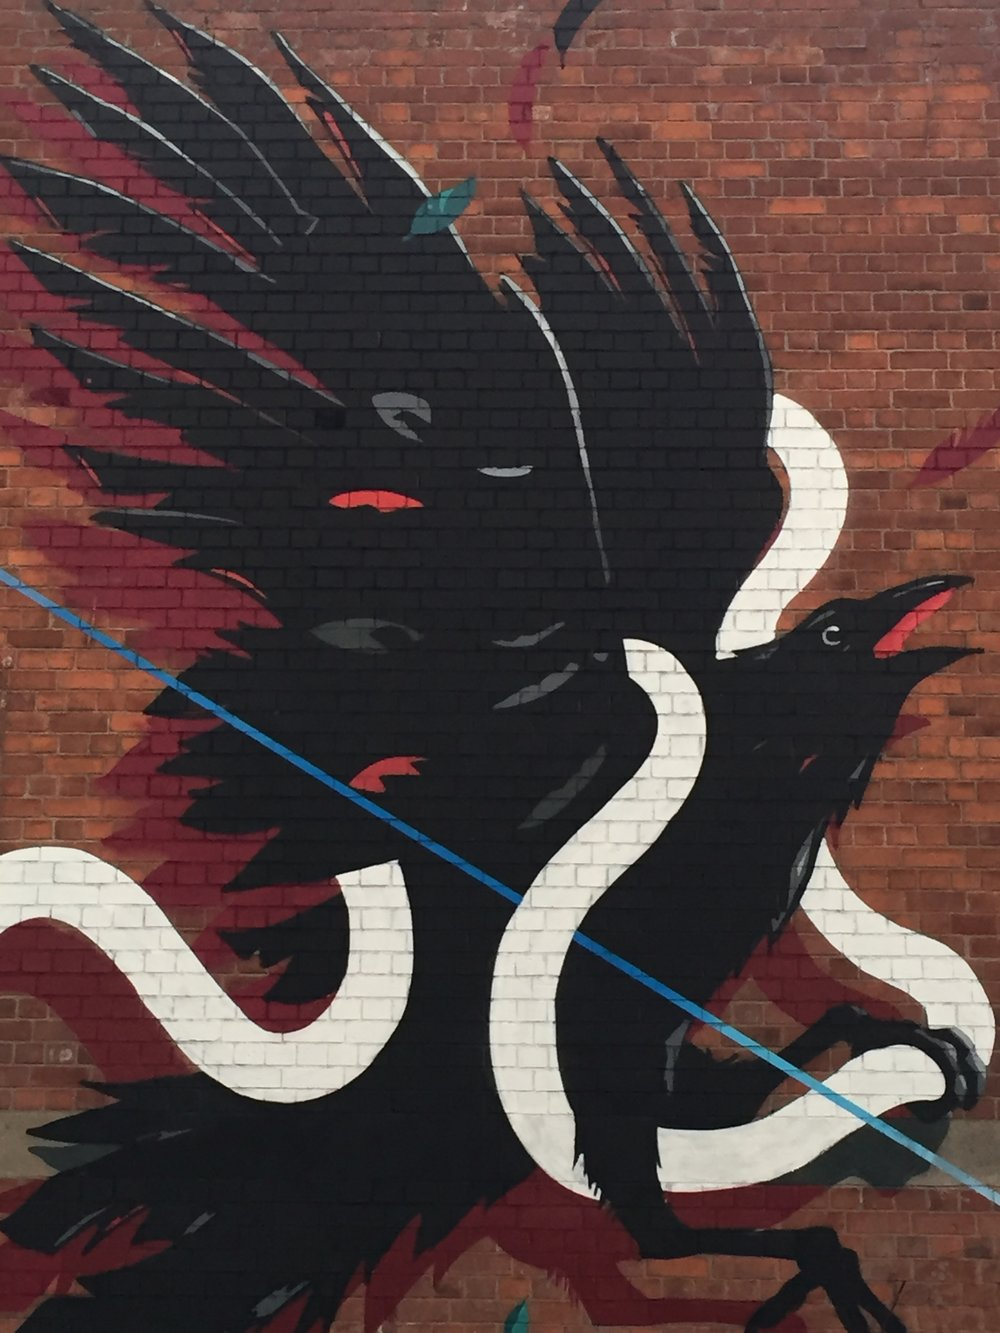 Street Art Belfast (Impressionistic)